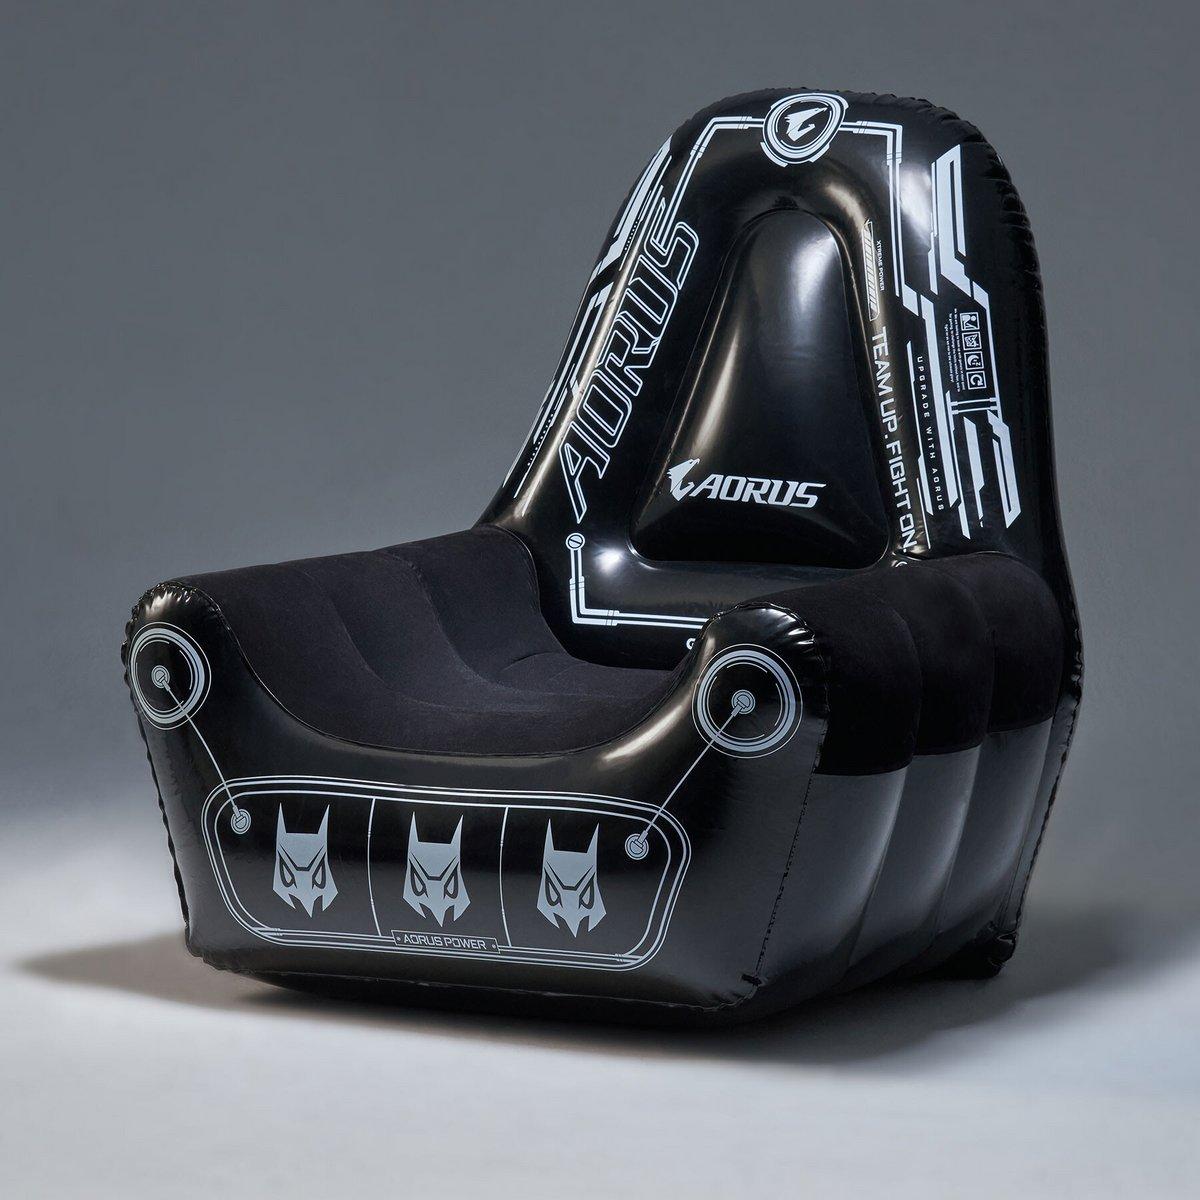 Aorus Gaming Chair © Gigabyte